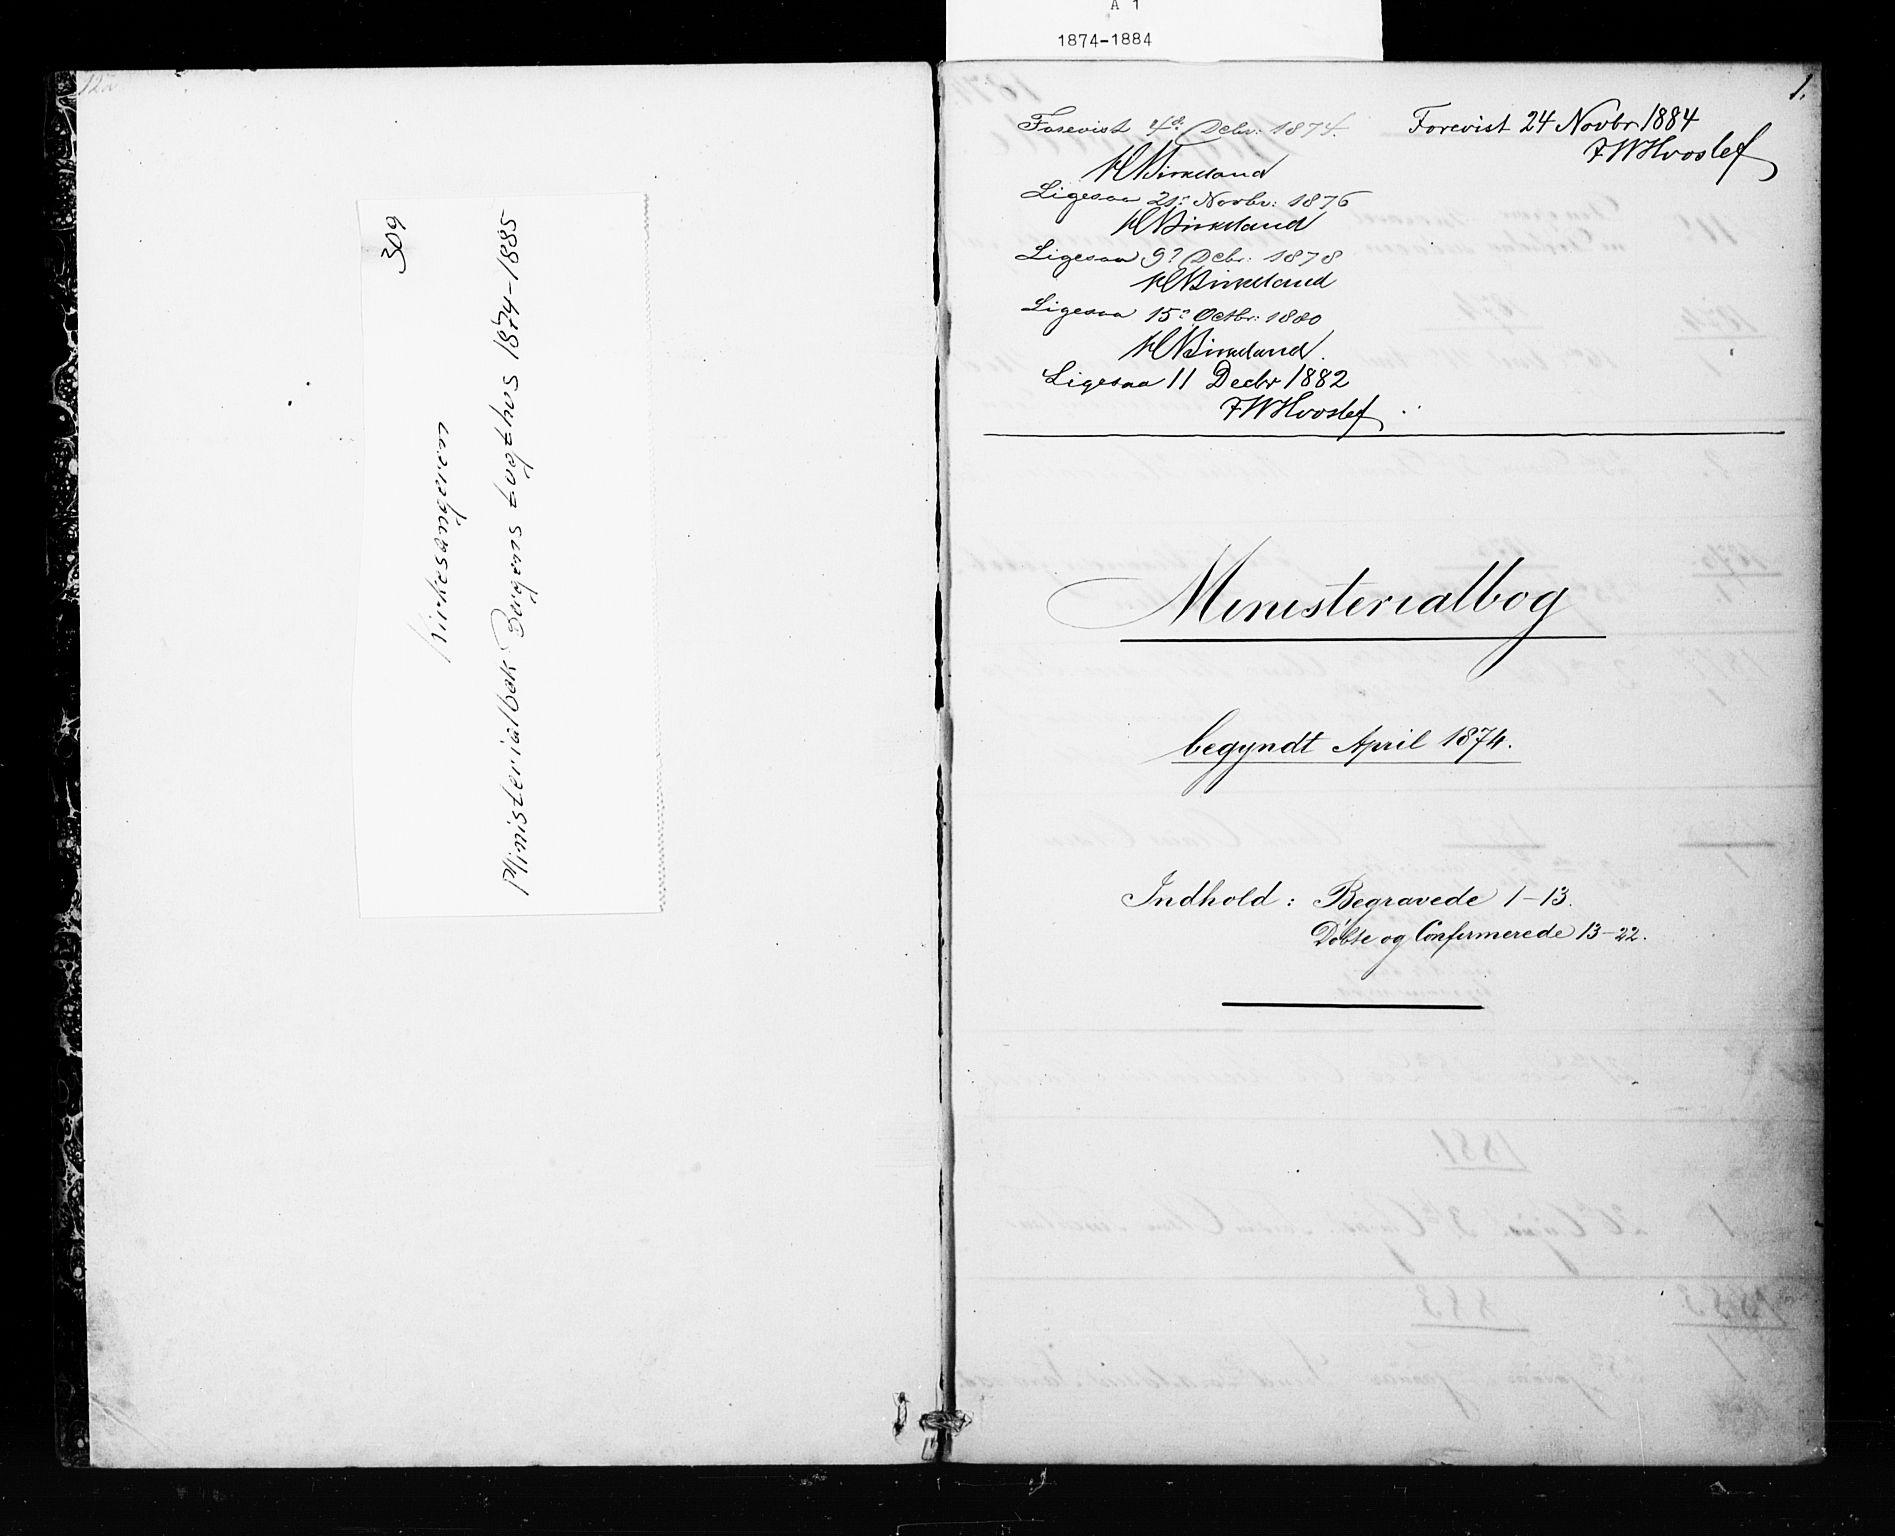 SAB, Bergens strafanstalts sokneprestembete*, Klokkerbok nr. A 1, 1874-1884, s. 1